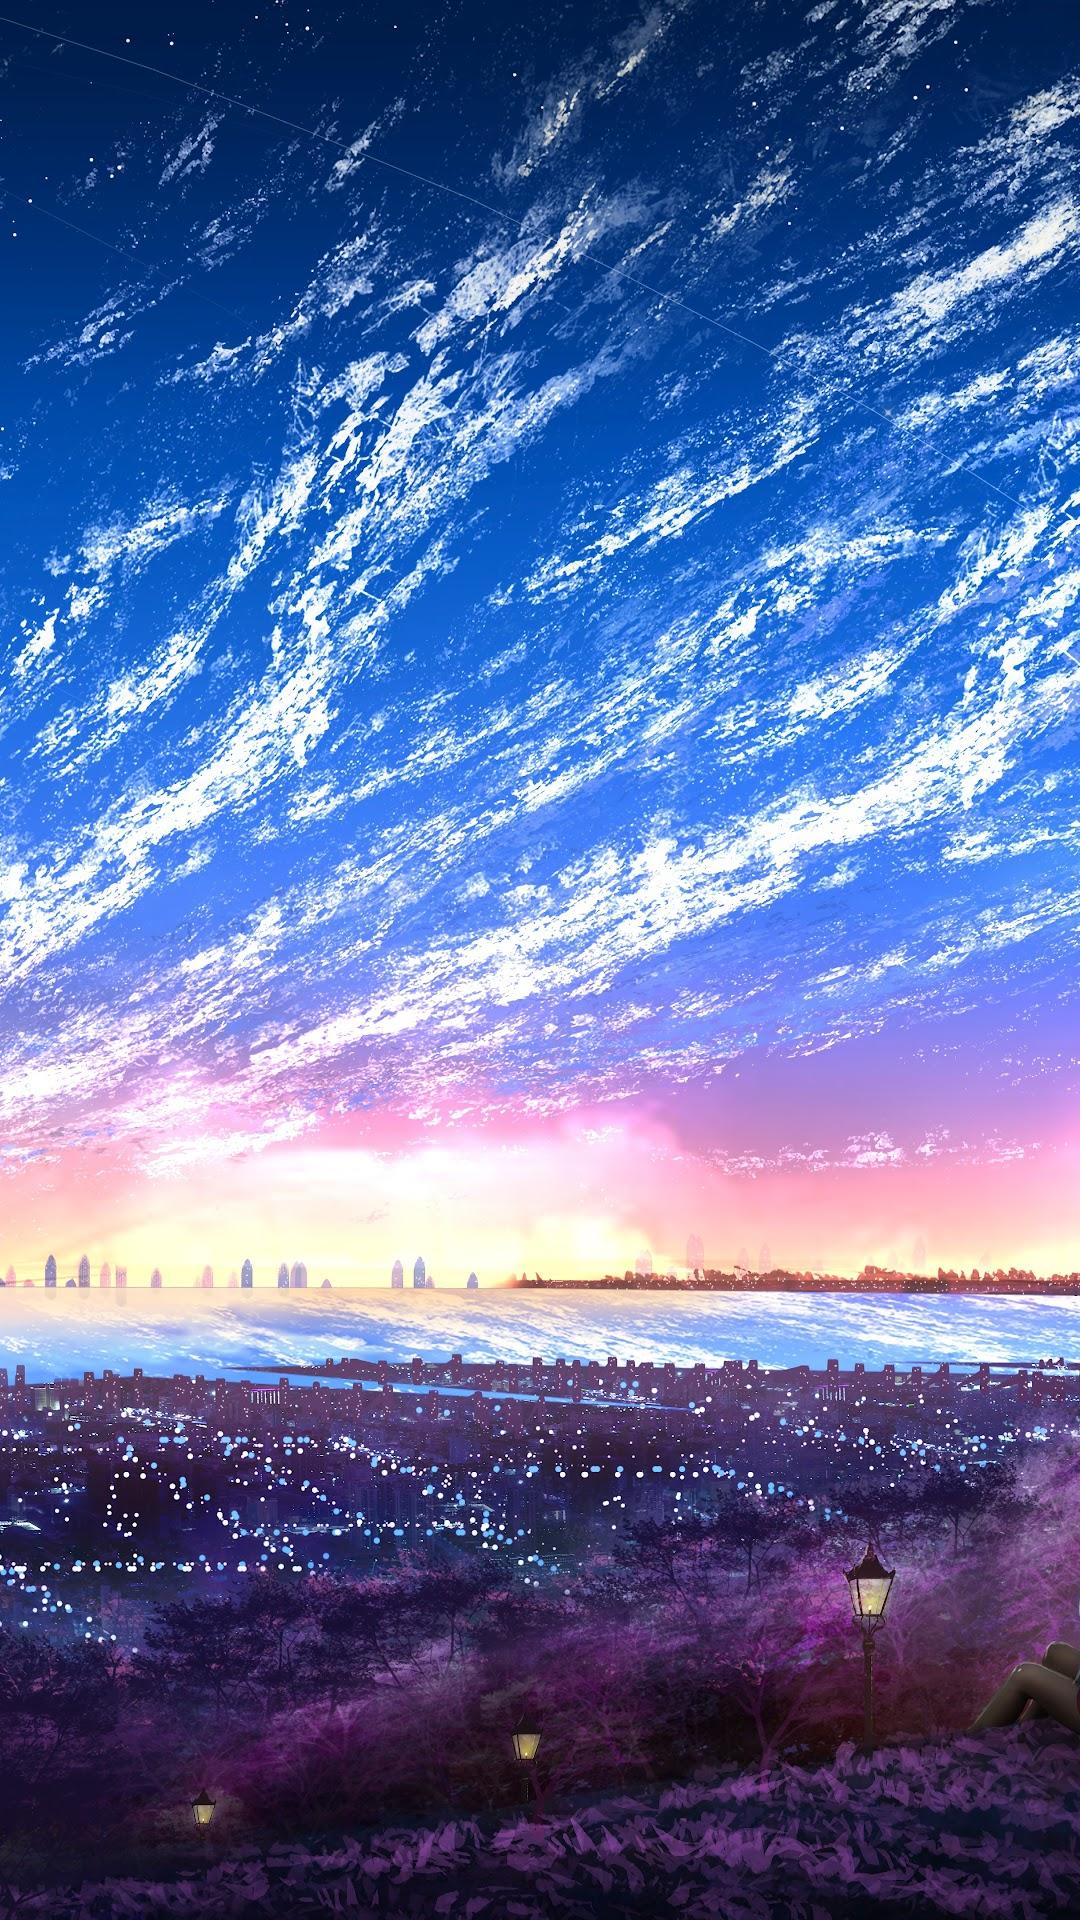 Sky City Scenery Horizon Landscape Anime 8k Wallpaper 131